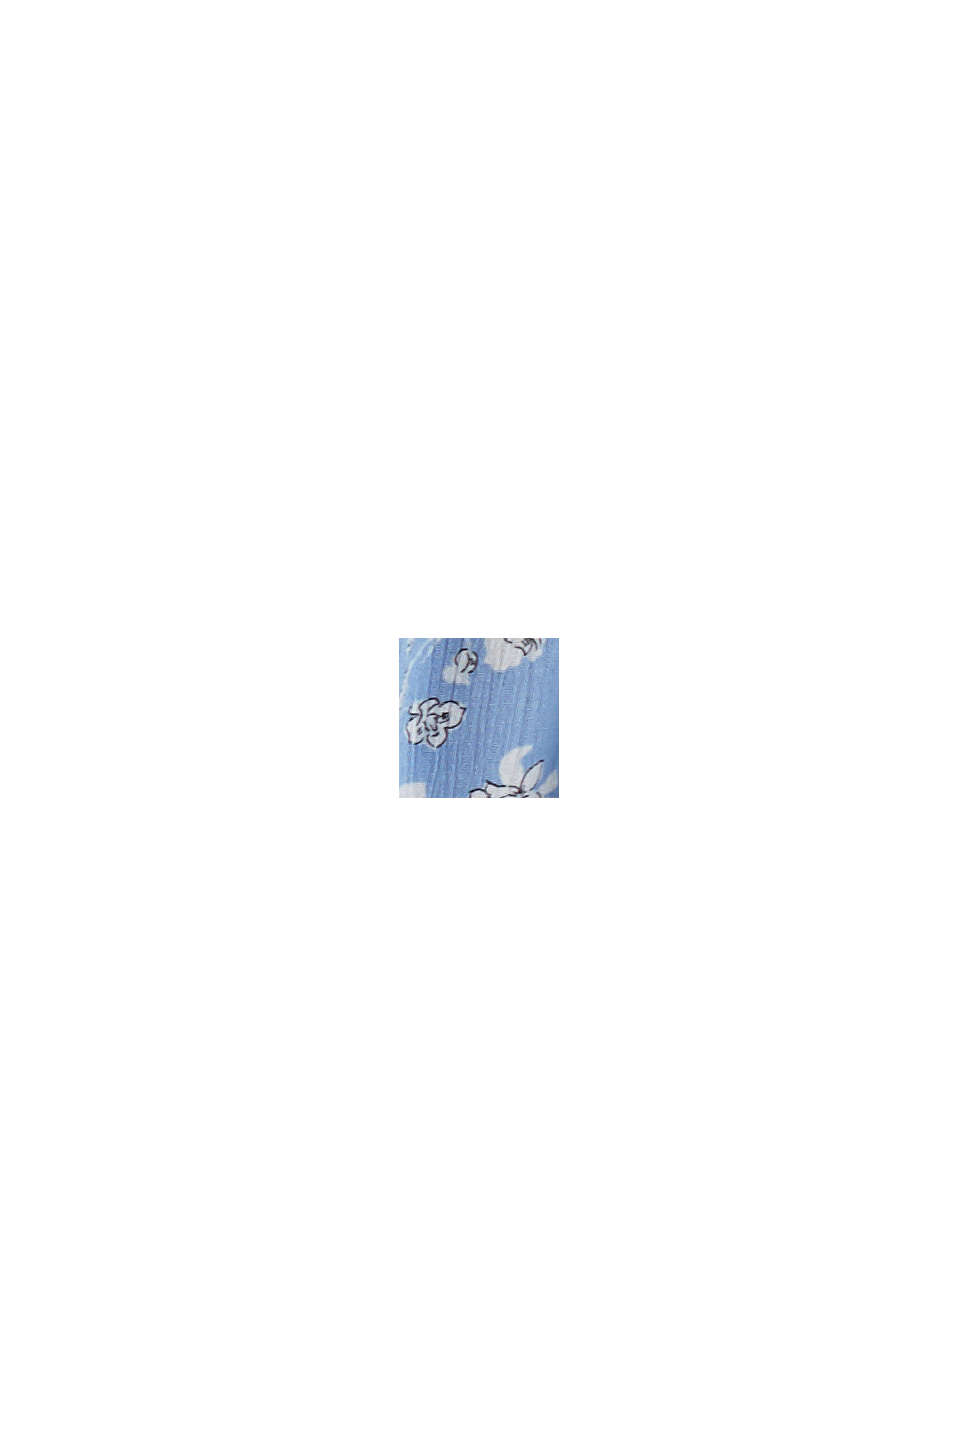 CURVY Print-Bluse aus LENZING™ ECOVERO™, LIGHT BLUE, swatch